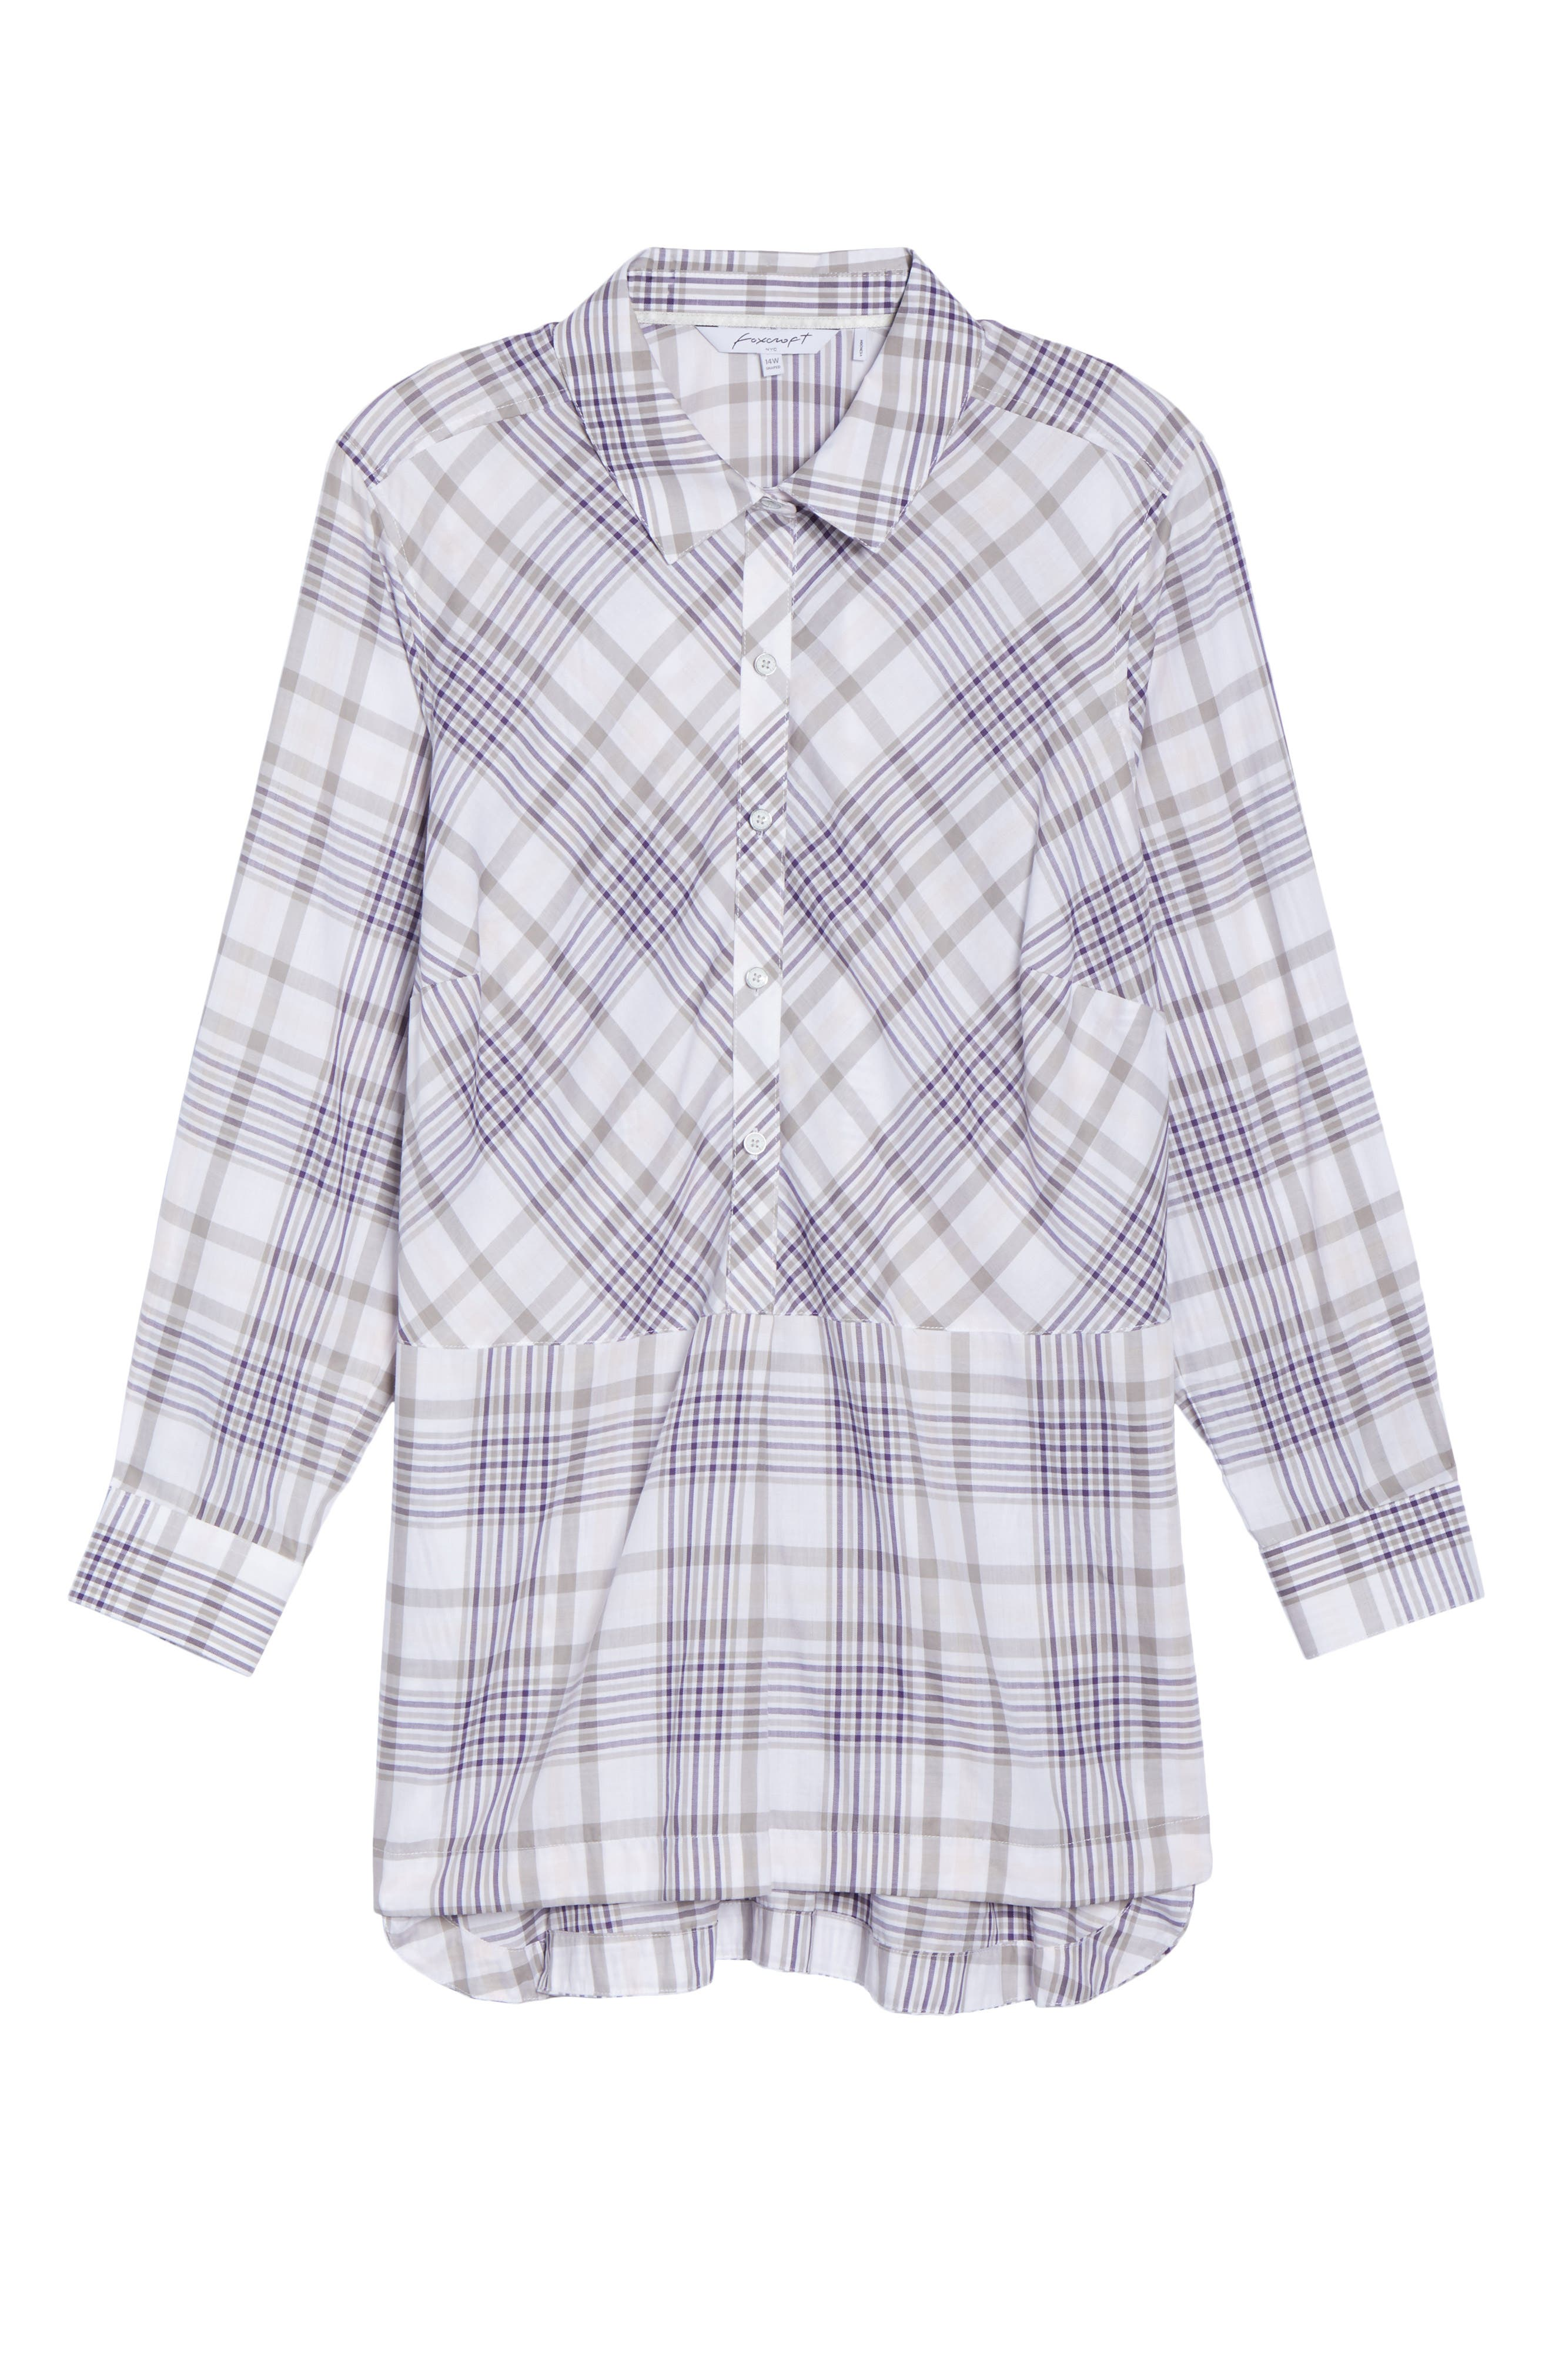 Maddy Winter Plaid Shirt,                             Alternate thumbnail 6, color,                             037